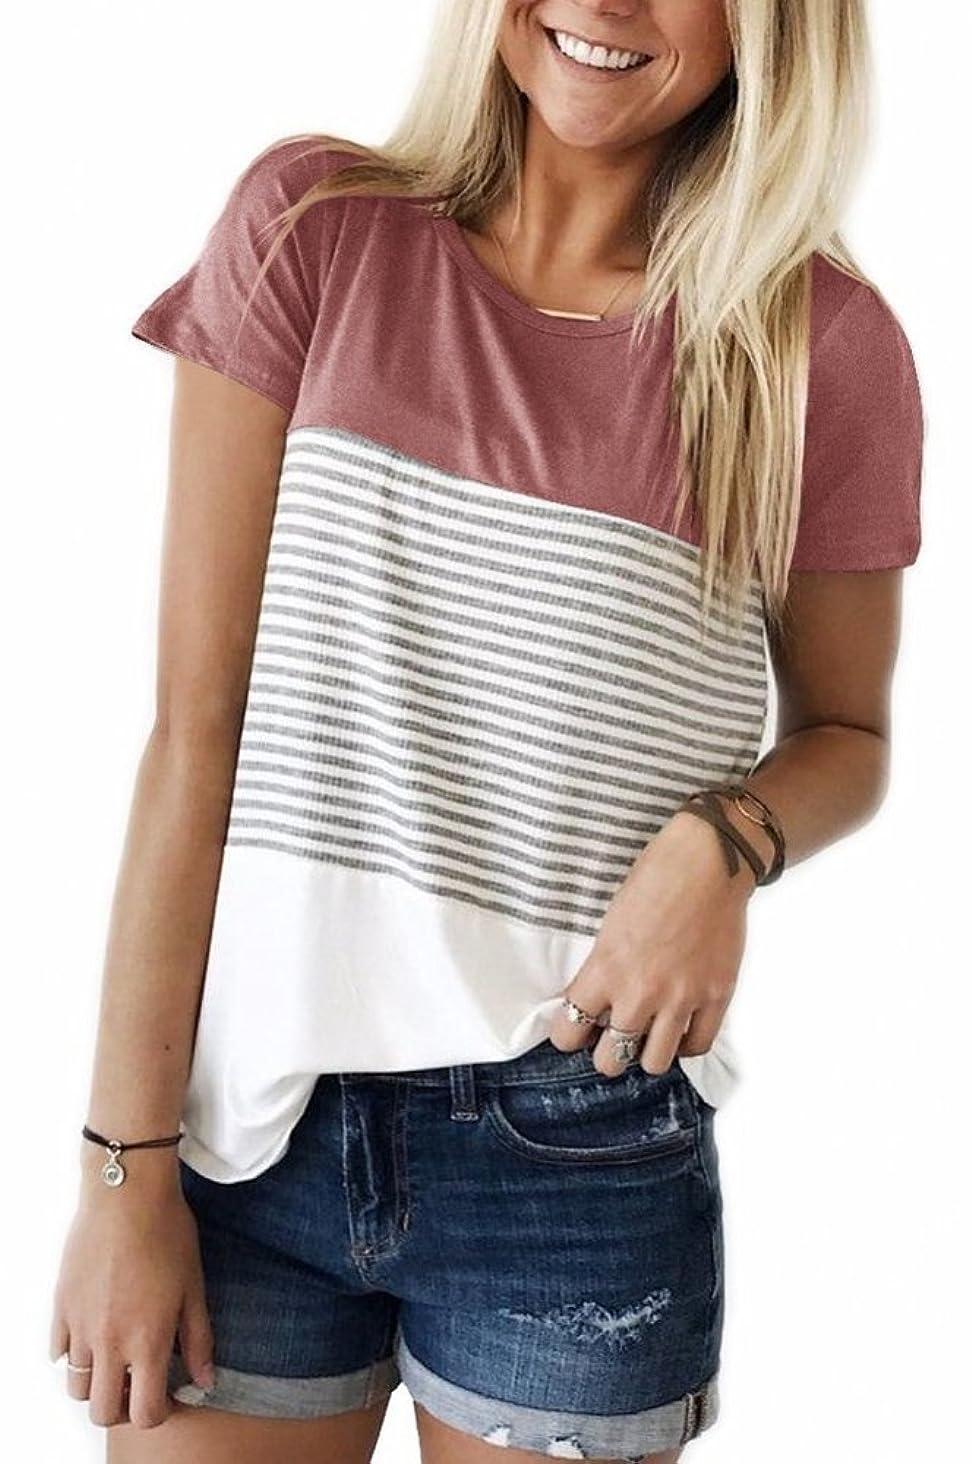 SMALNNIE Women's Casual Short Sleeve T Shirt Triple Color Block Stripe Top Blouse S-XXL